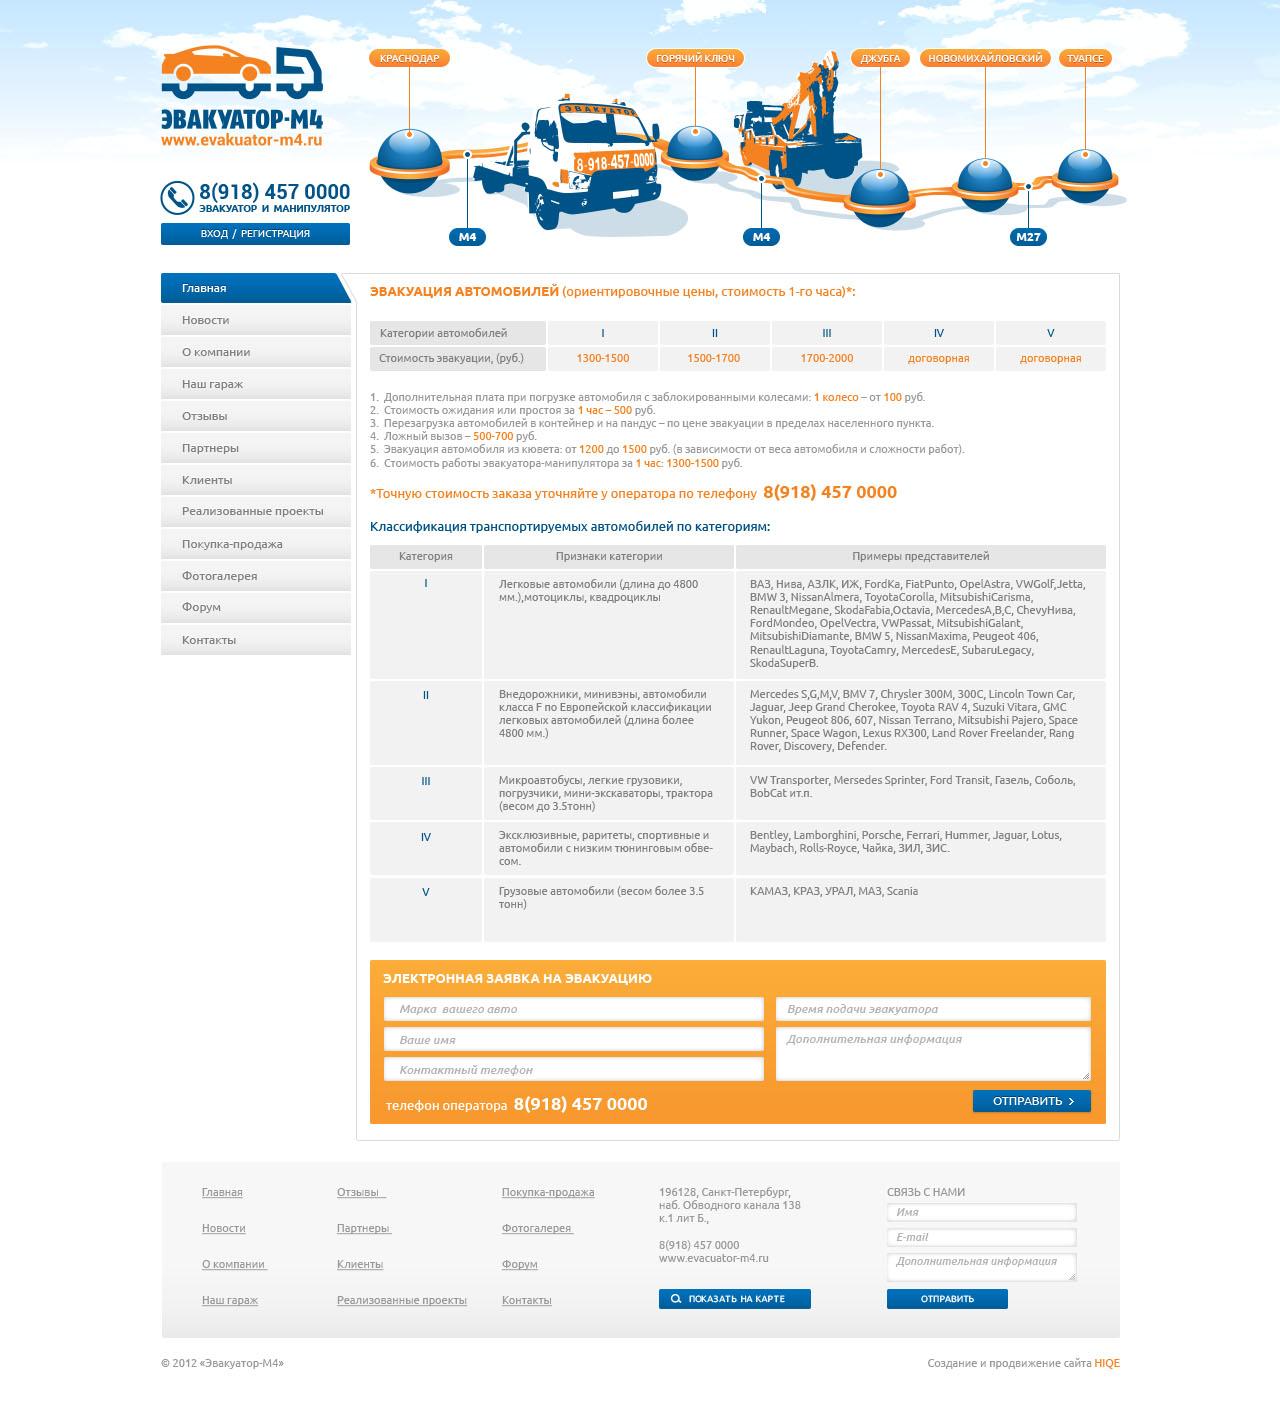 Сайт компании Evakuator-m4.